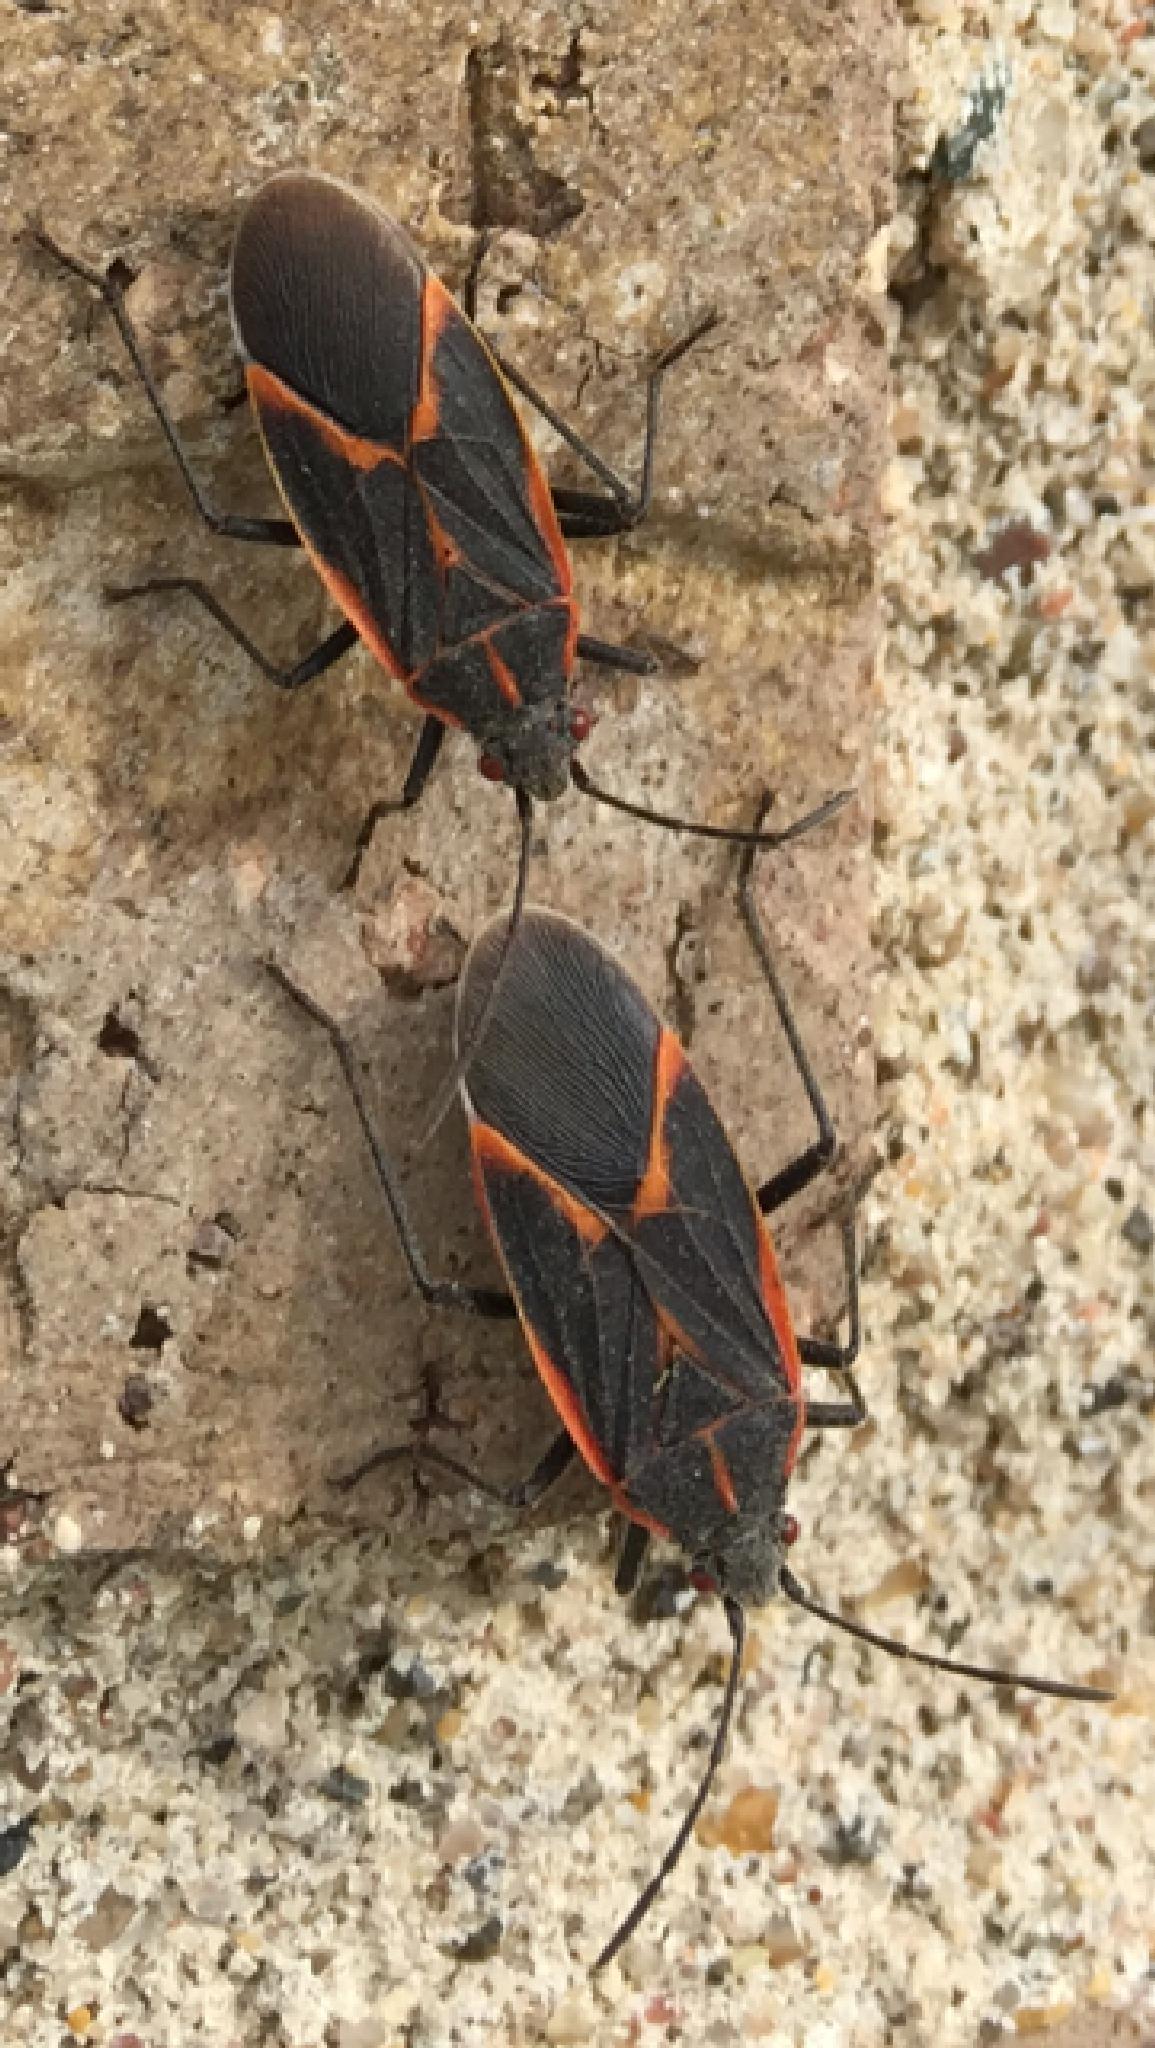 Box Elder Bugs by shaunarwhitaker